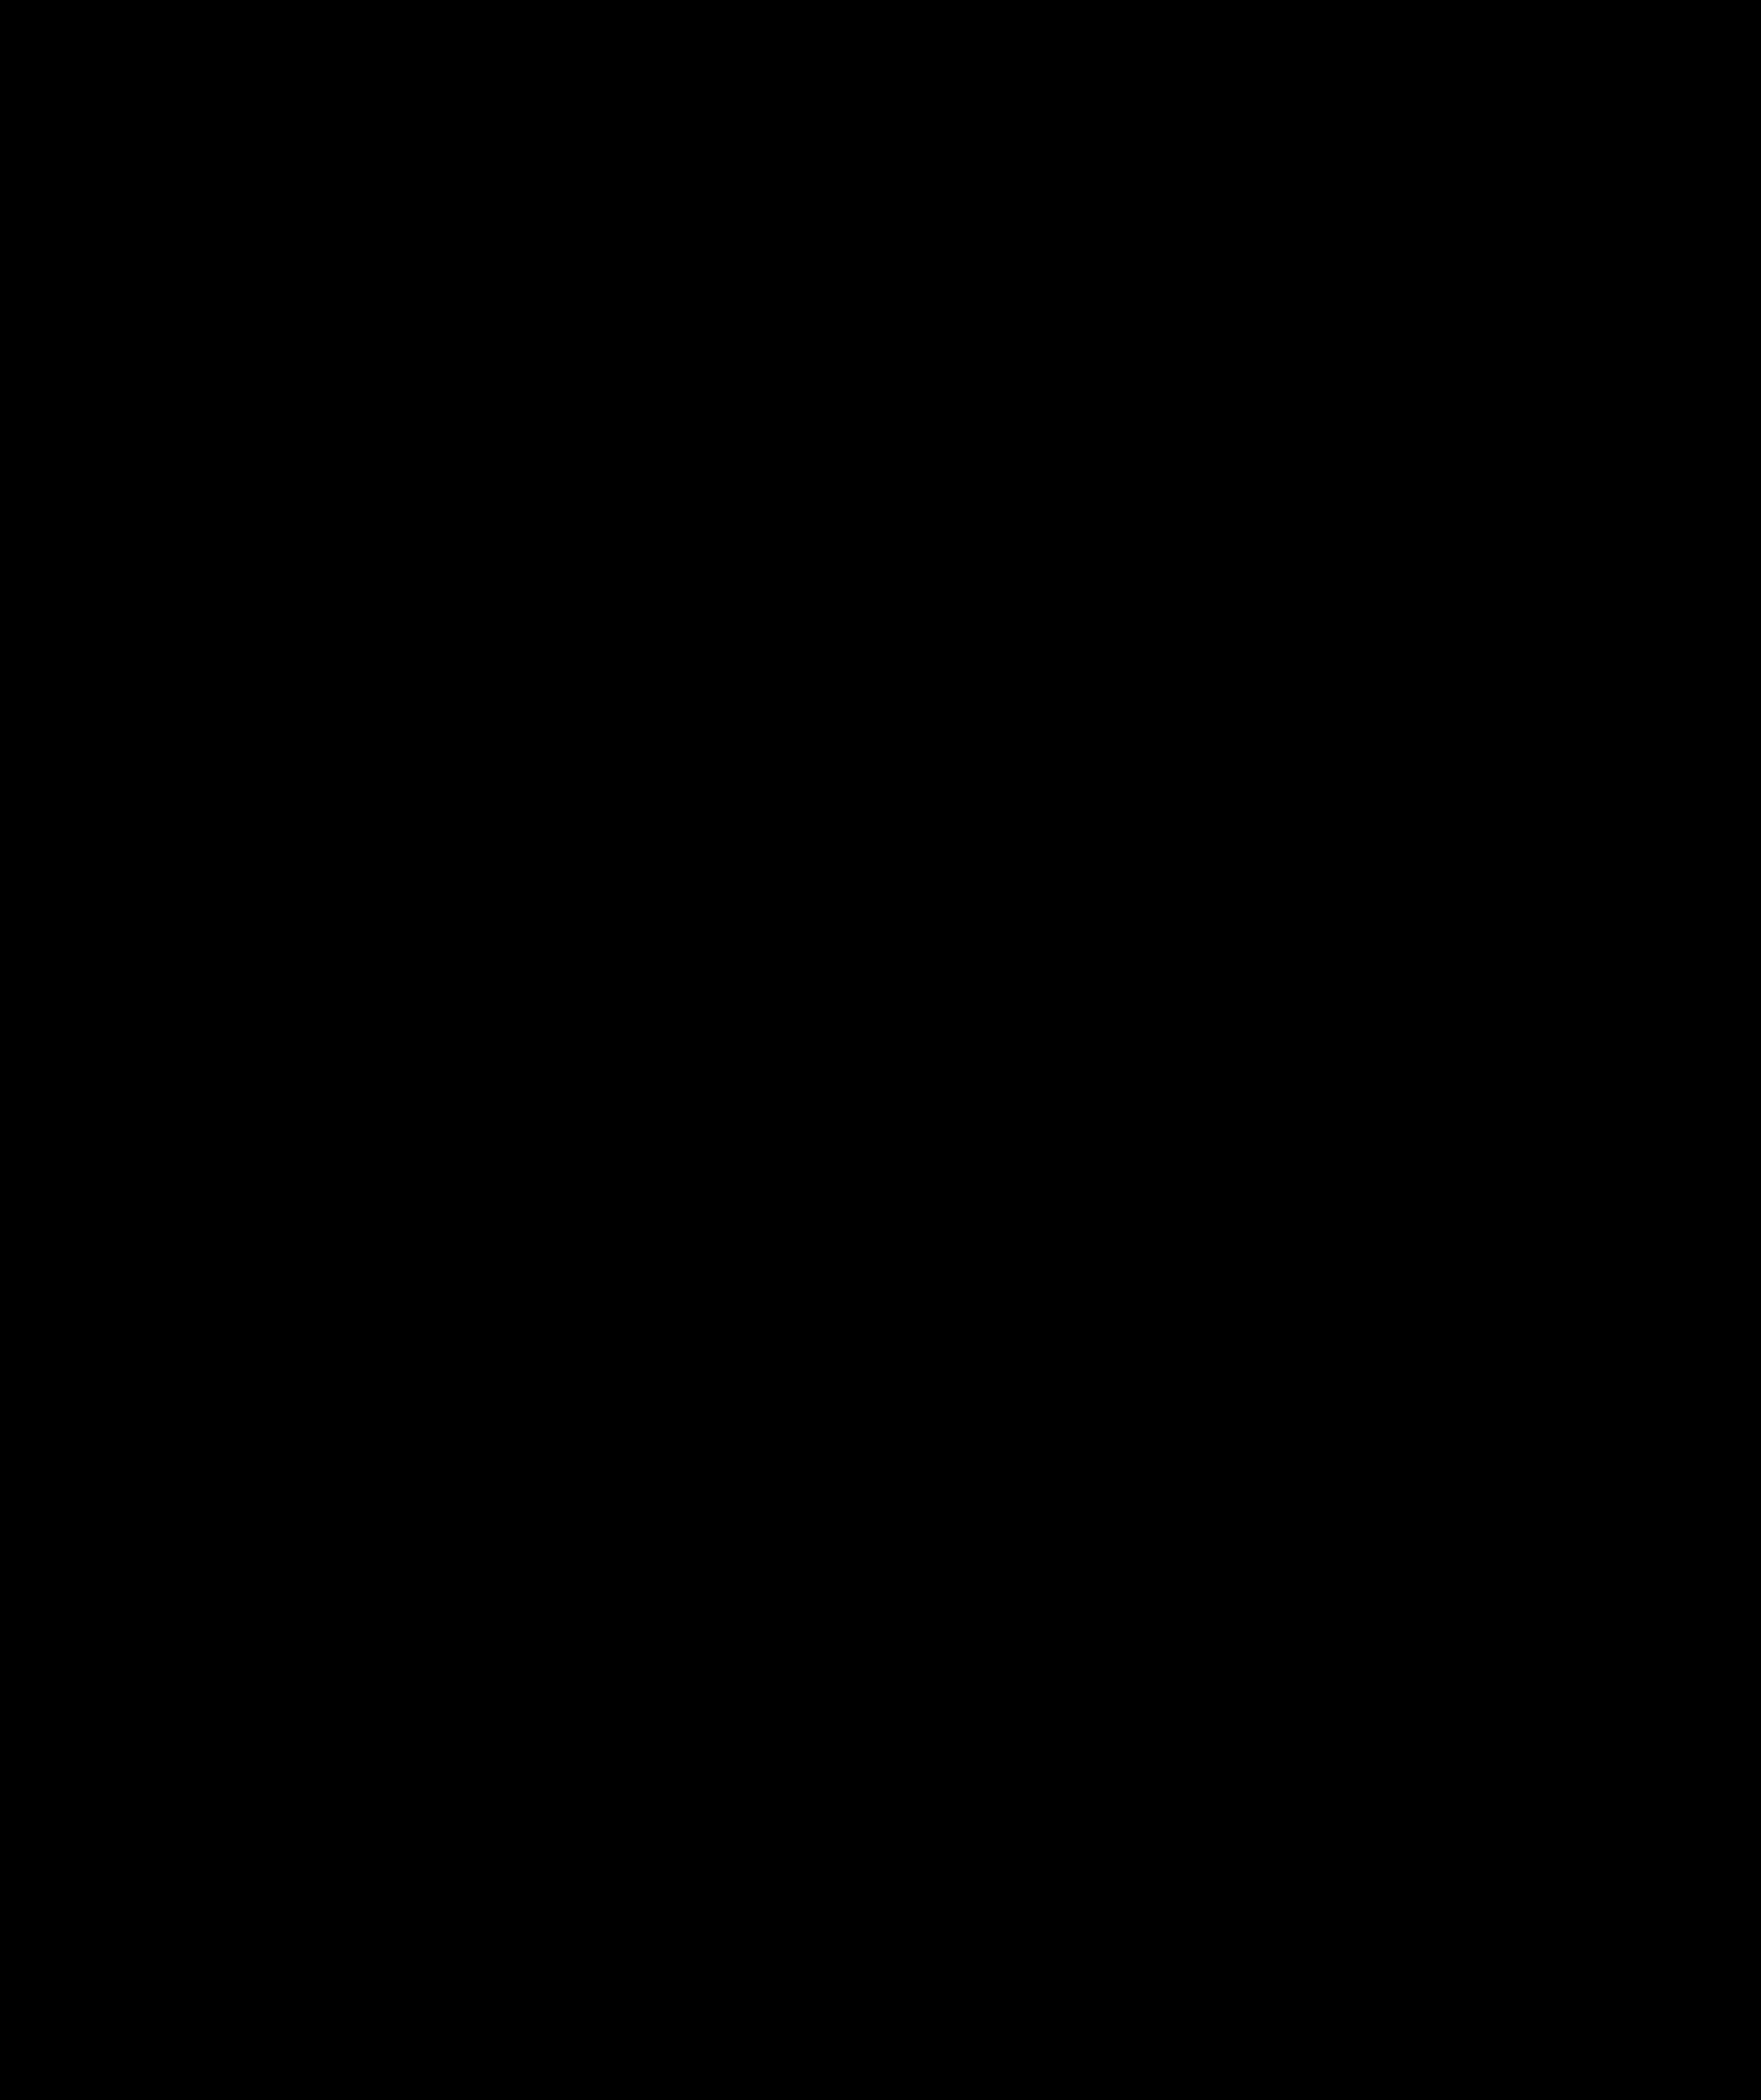 2012x2400 Clipart